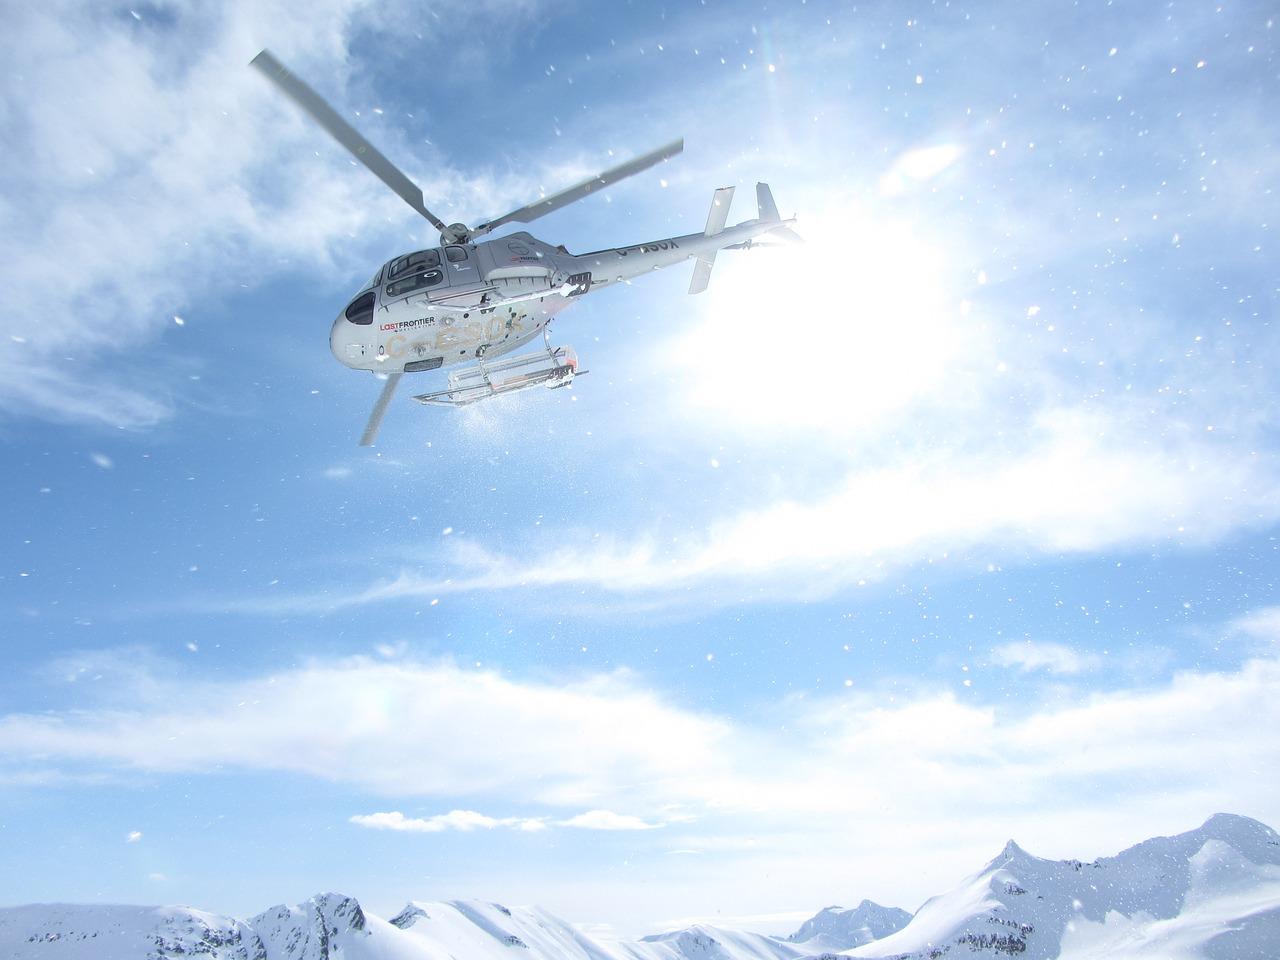 heli-skiing in europe